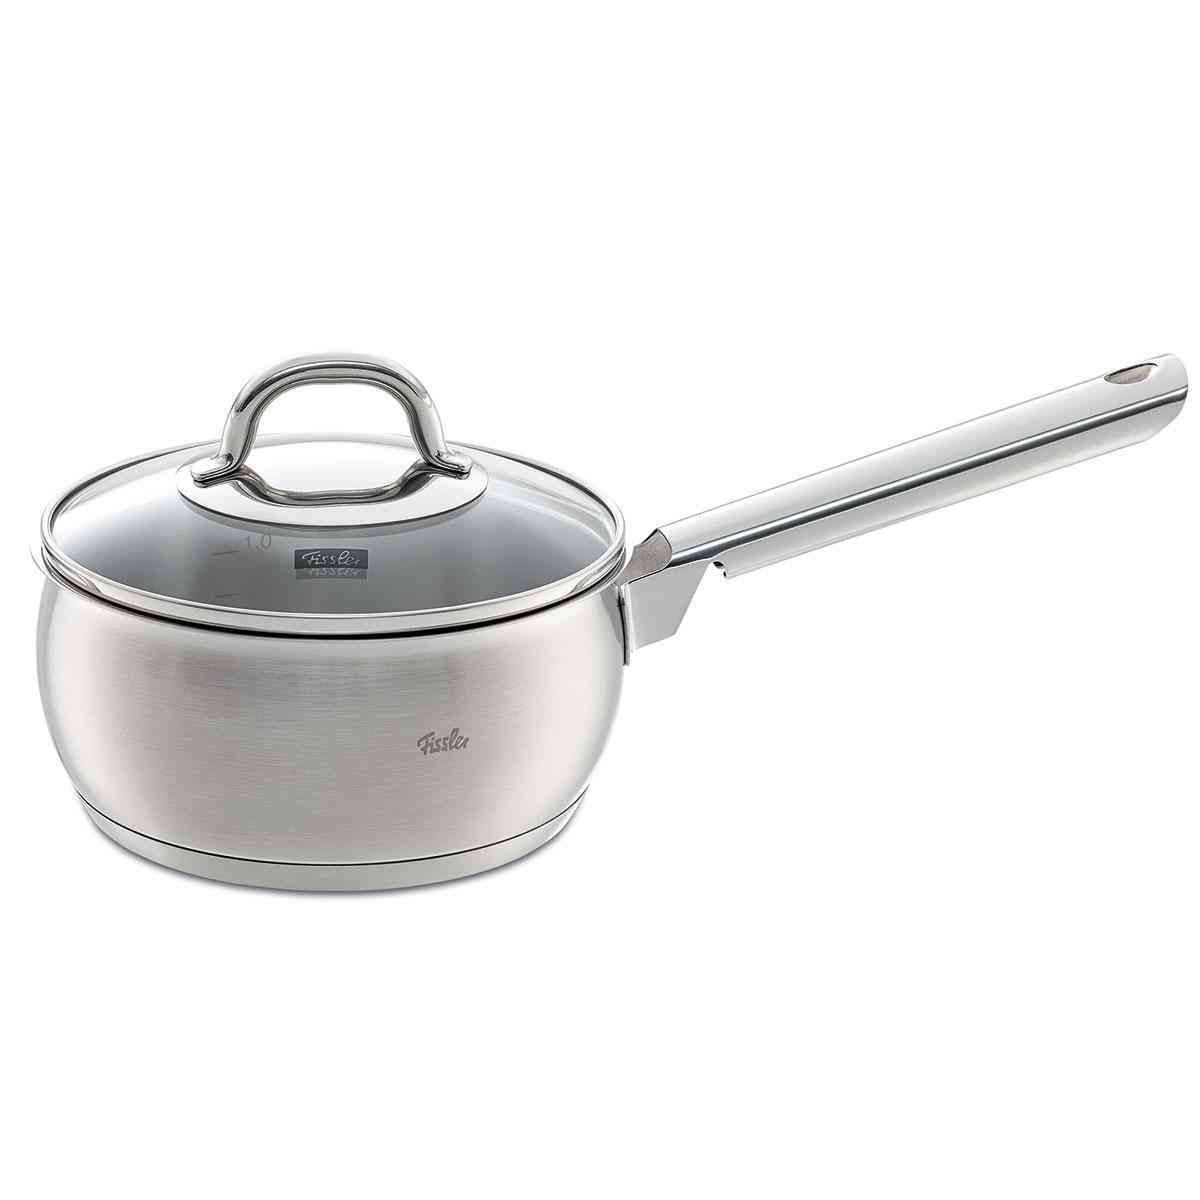 valea saucepan with lid 16 cm